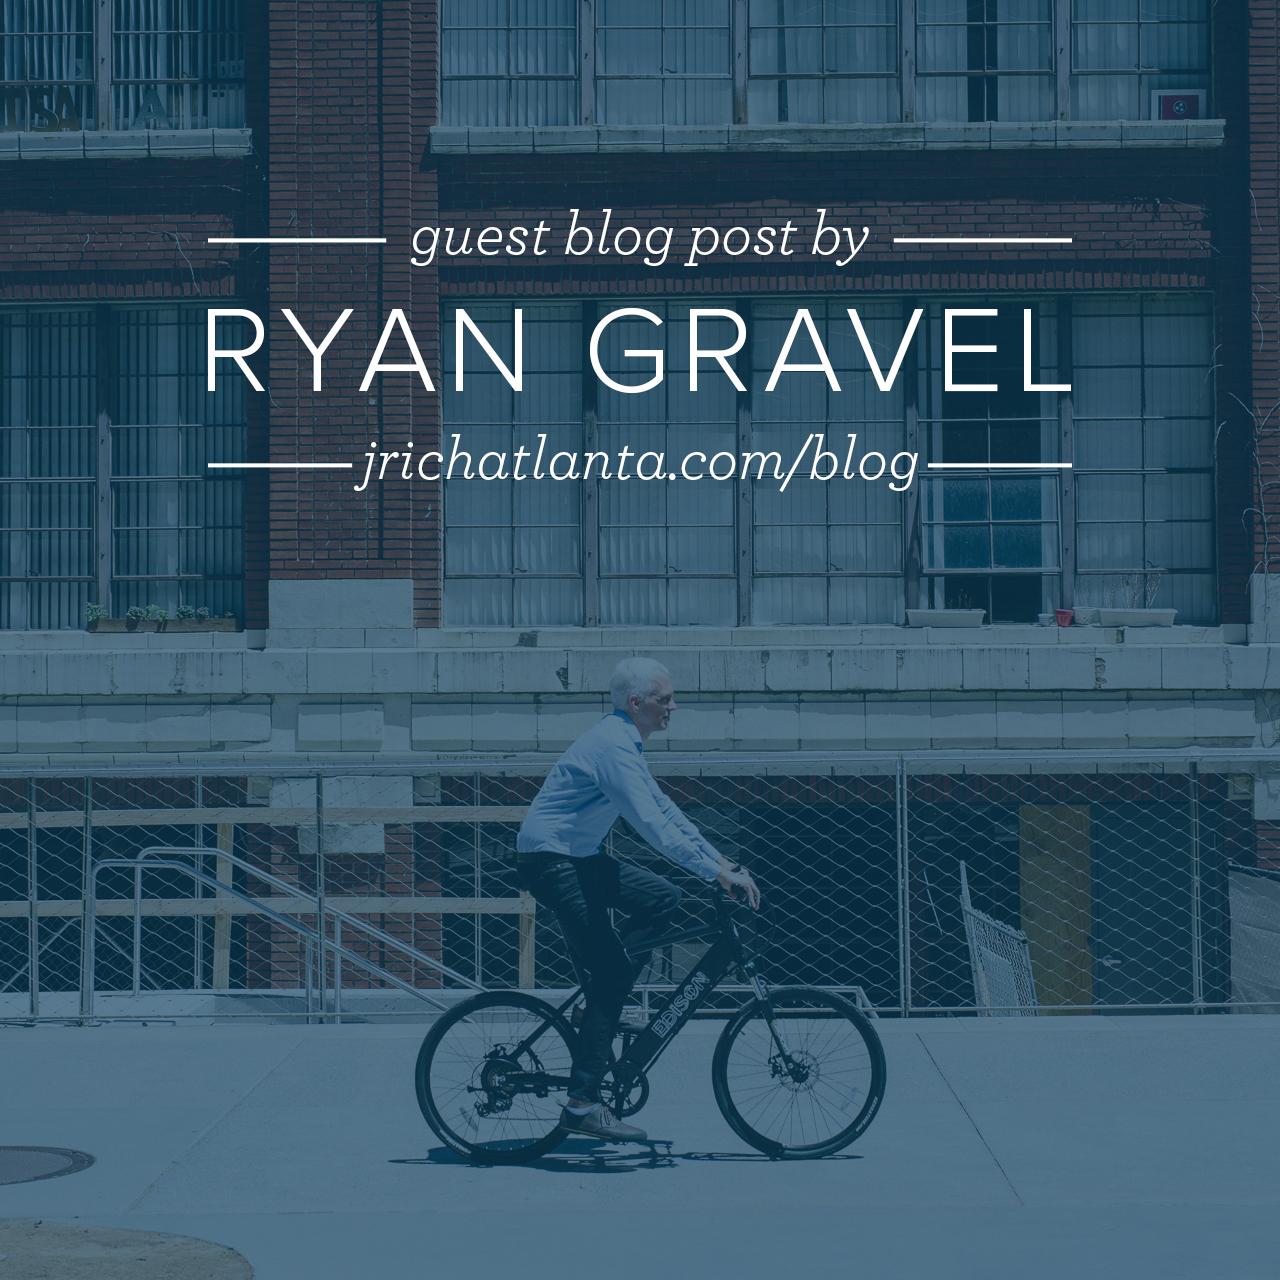 Ryan-Gravel-Guest-Blog-INSTA.jpg